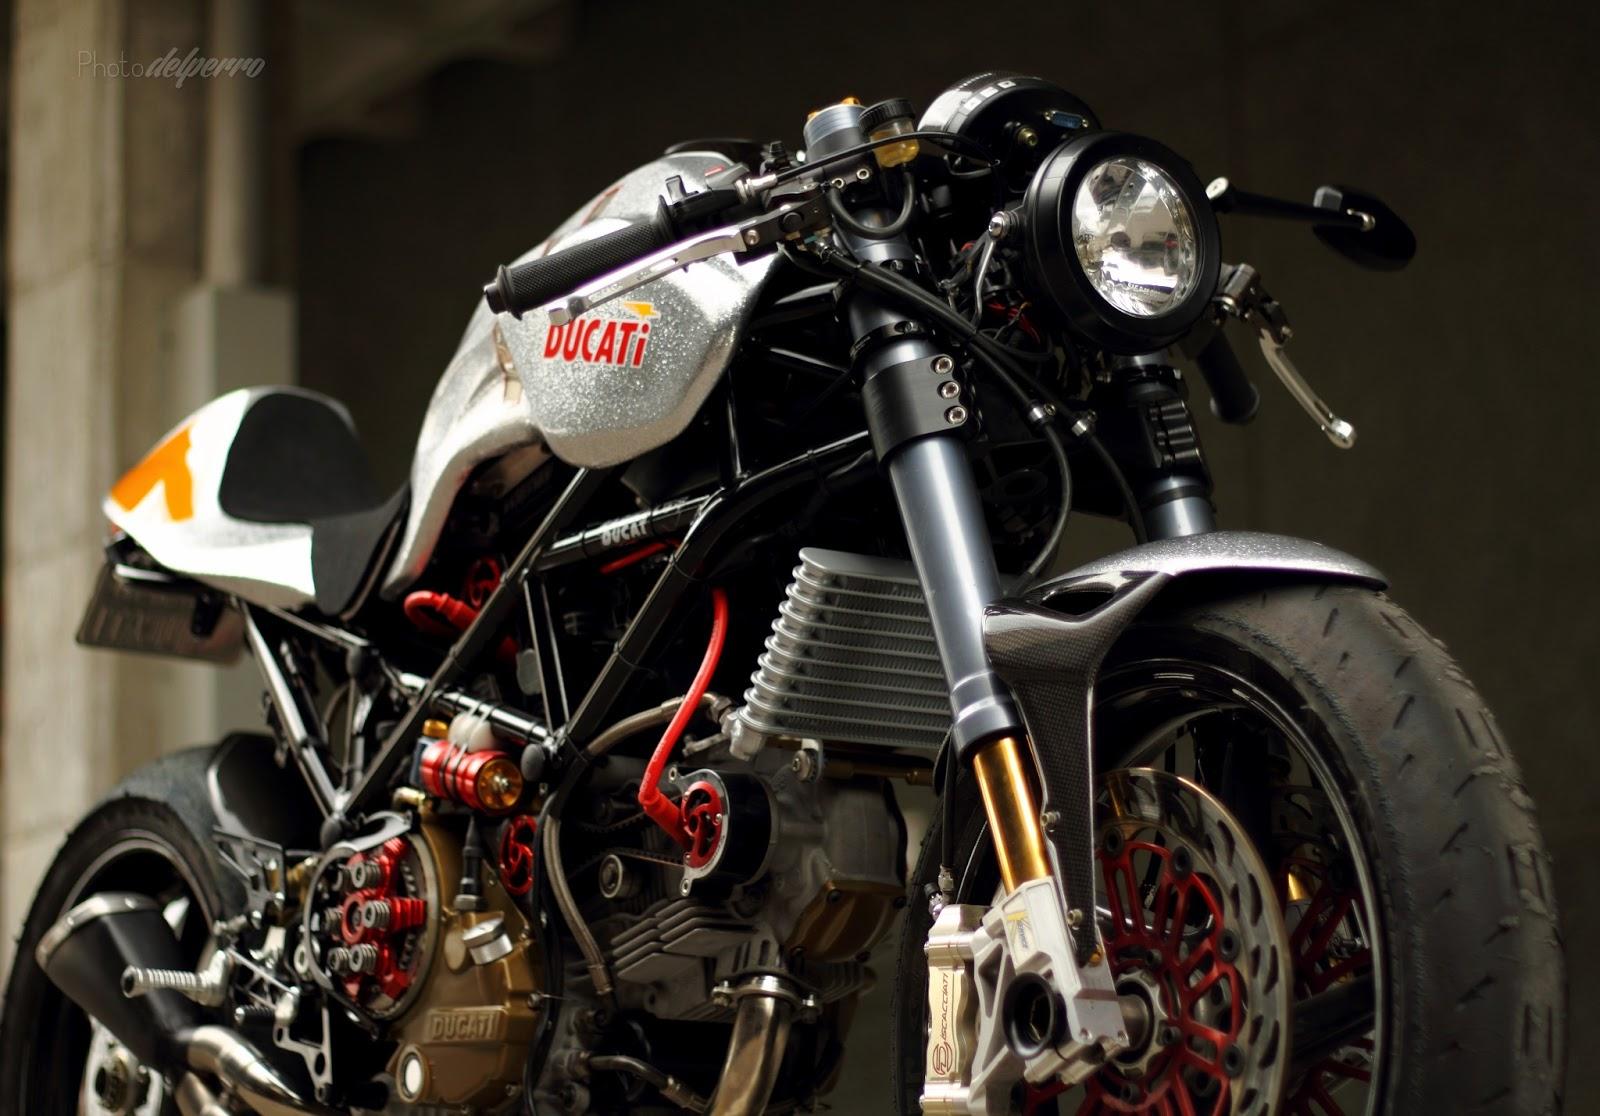 Ducati Cafe Racer Monster S2r 1000 Cafe Racer Way2speed